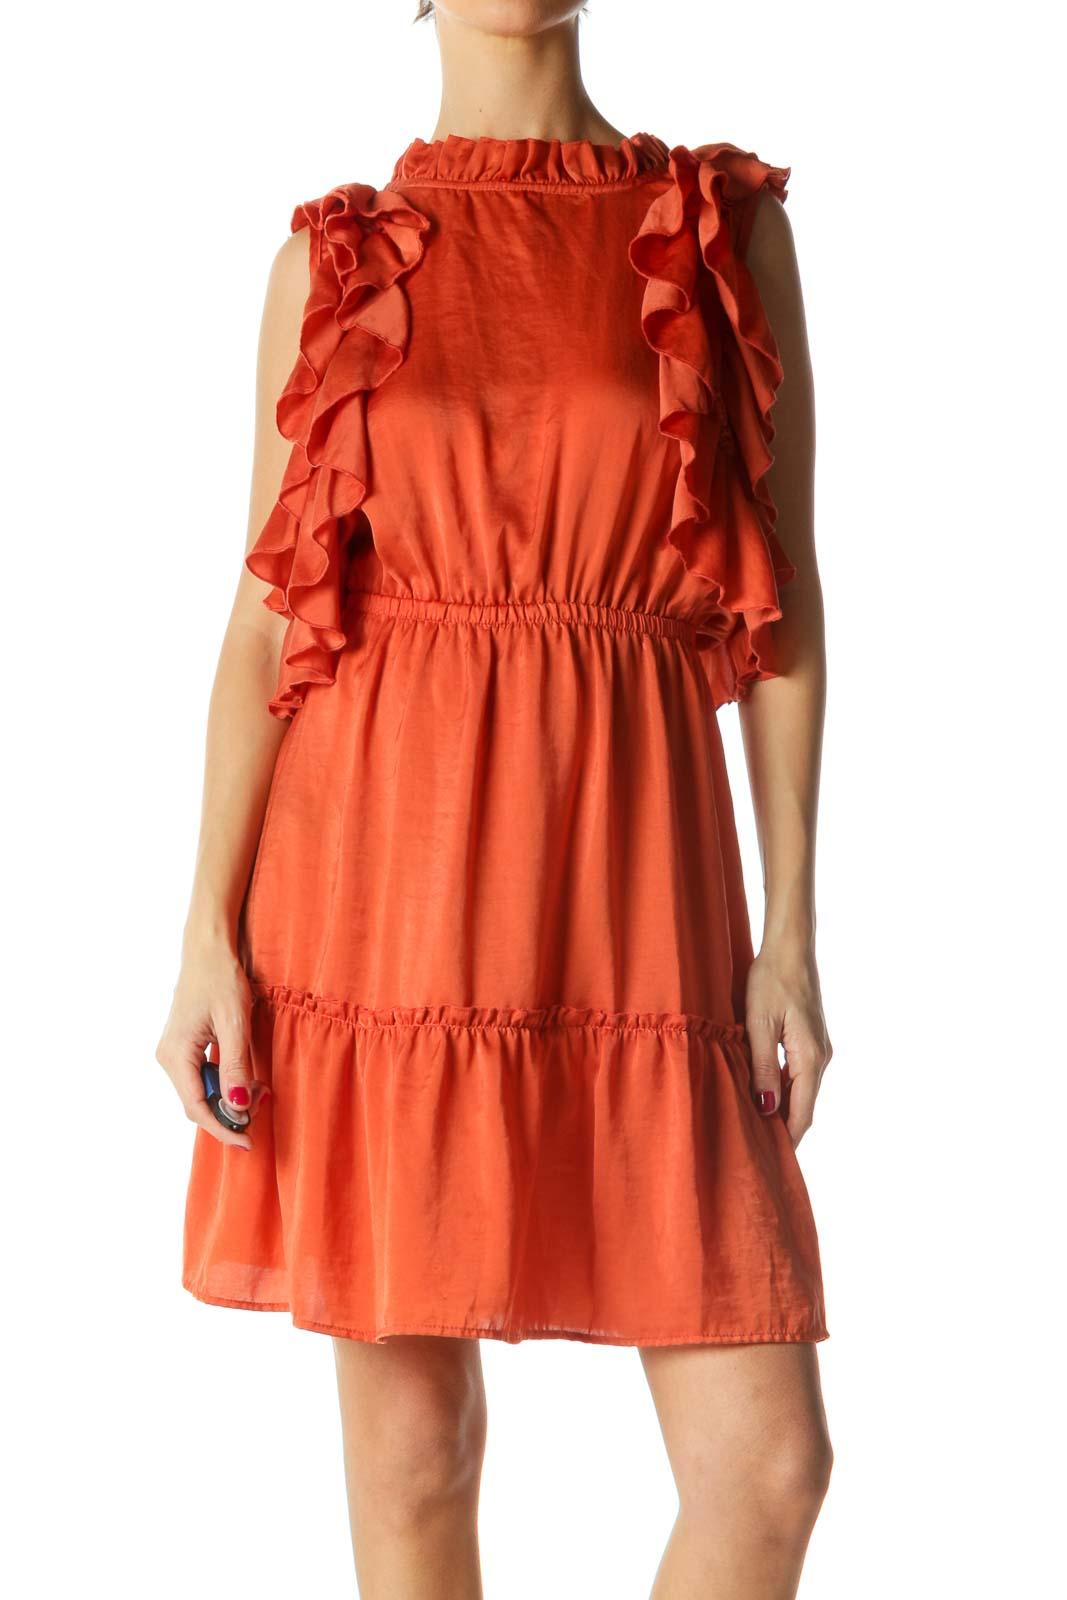 Orange Ruffled Dress